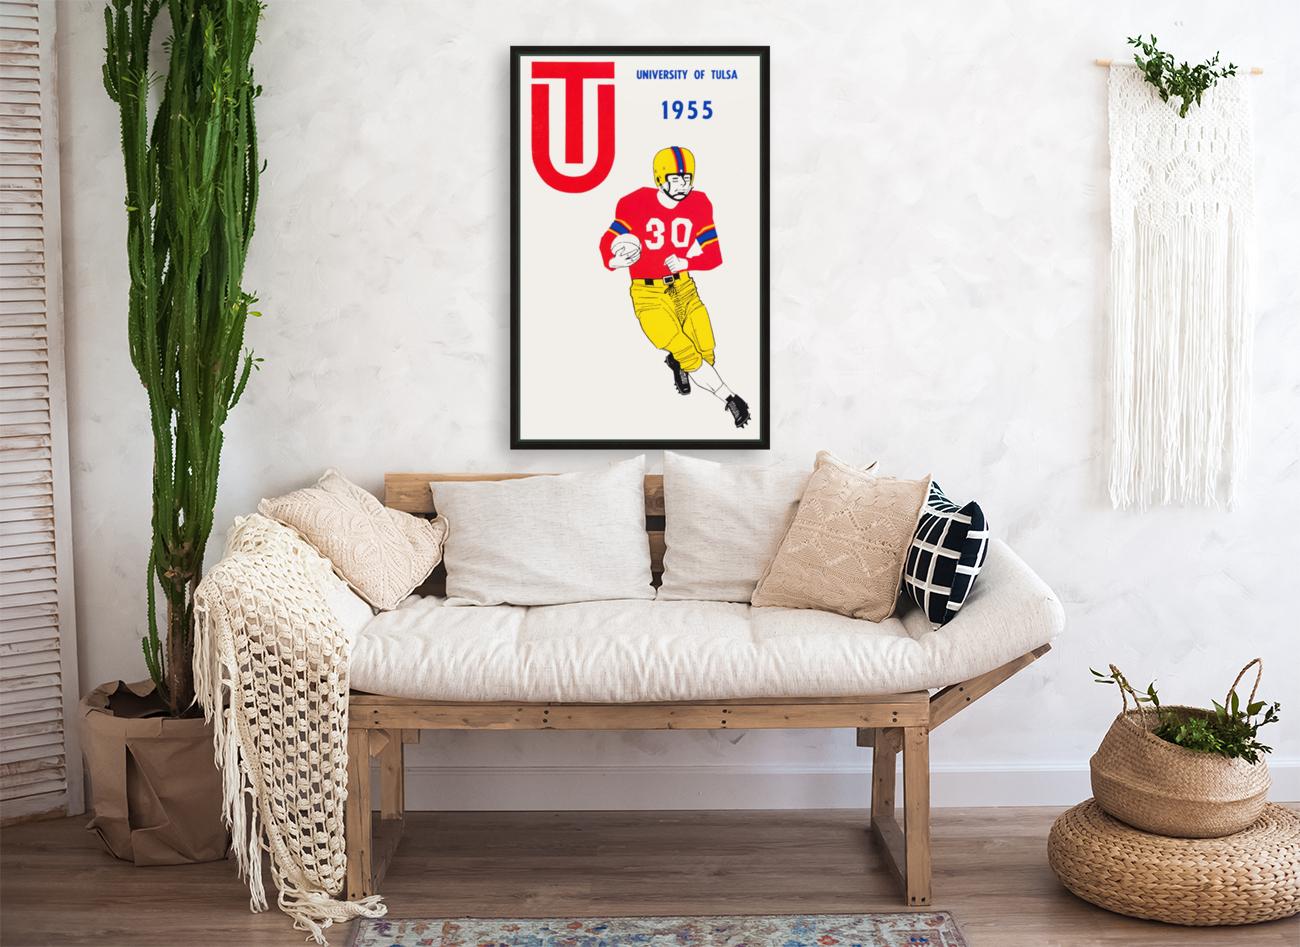 1955 university of tulsa football poster  Art